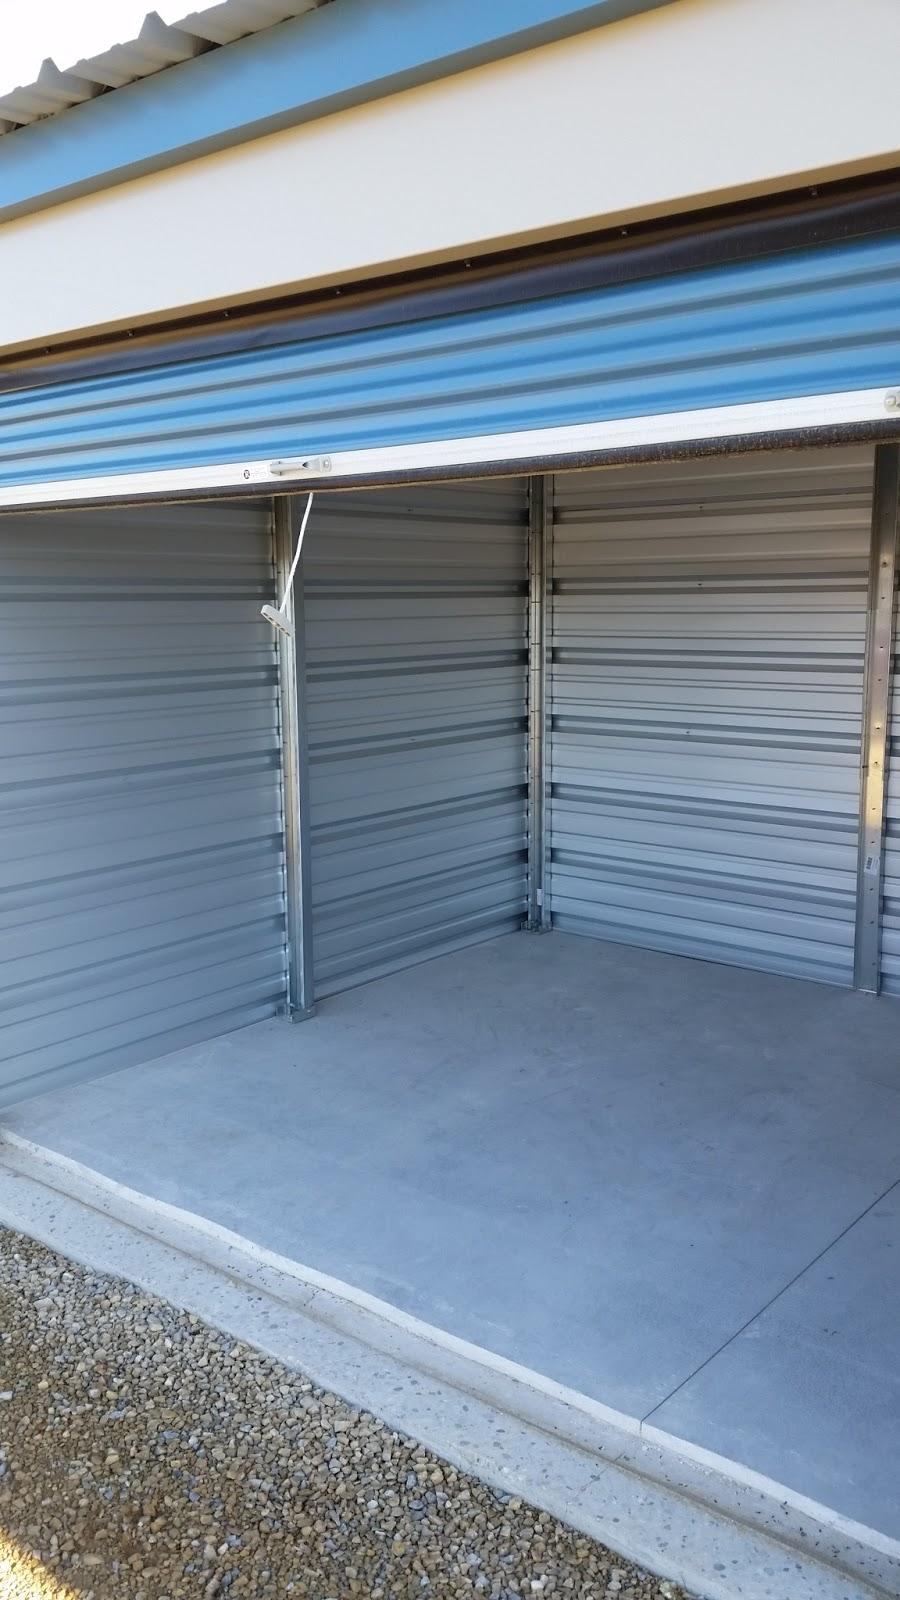 New Glarus Wäsche Center and Storage - car wash  | Photo 3 of 10 | Address: 1500 WI-69 Box 595, New Glarus, WI 53574, USA | Phone: (608) 620-4287